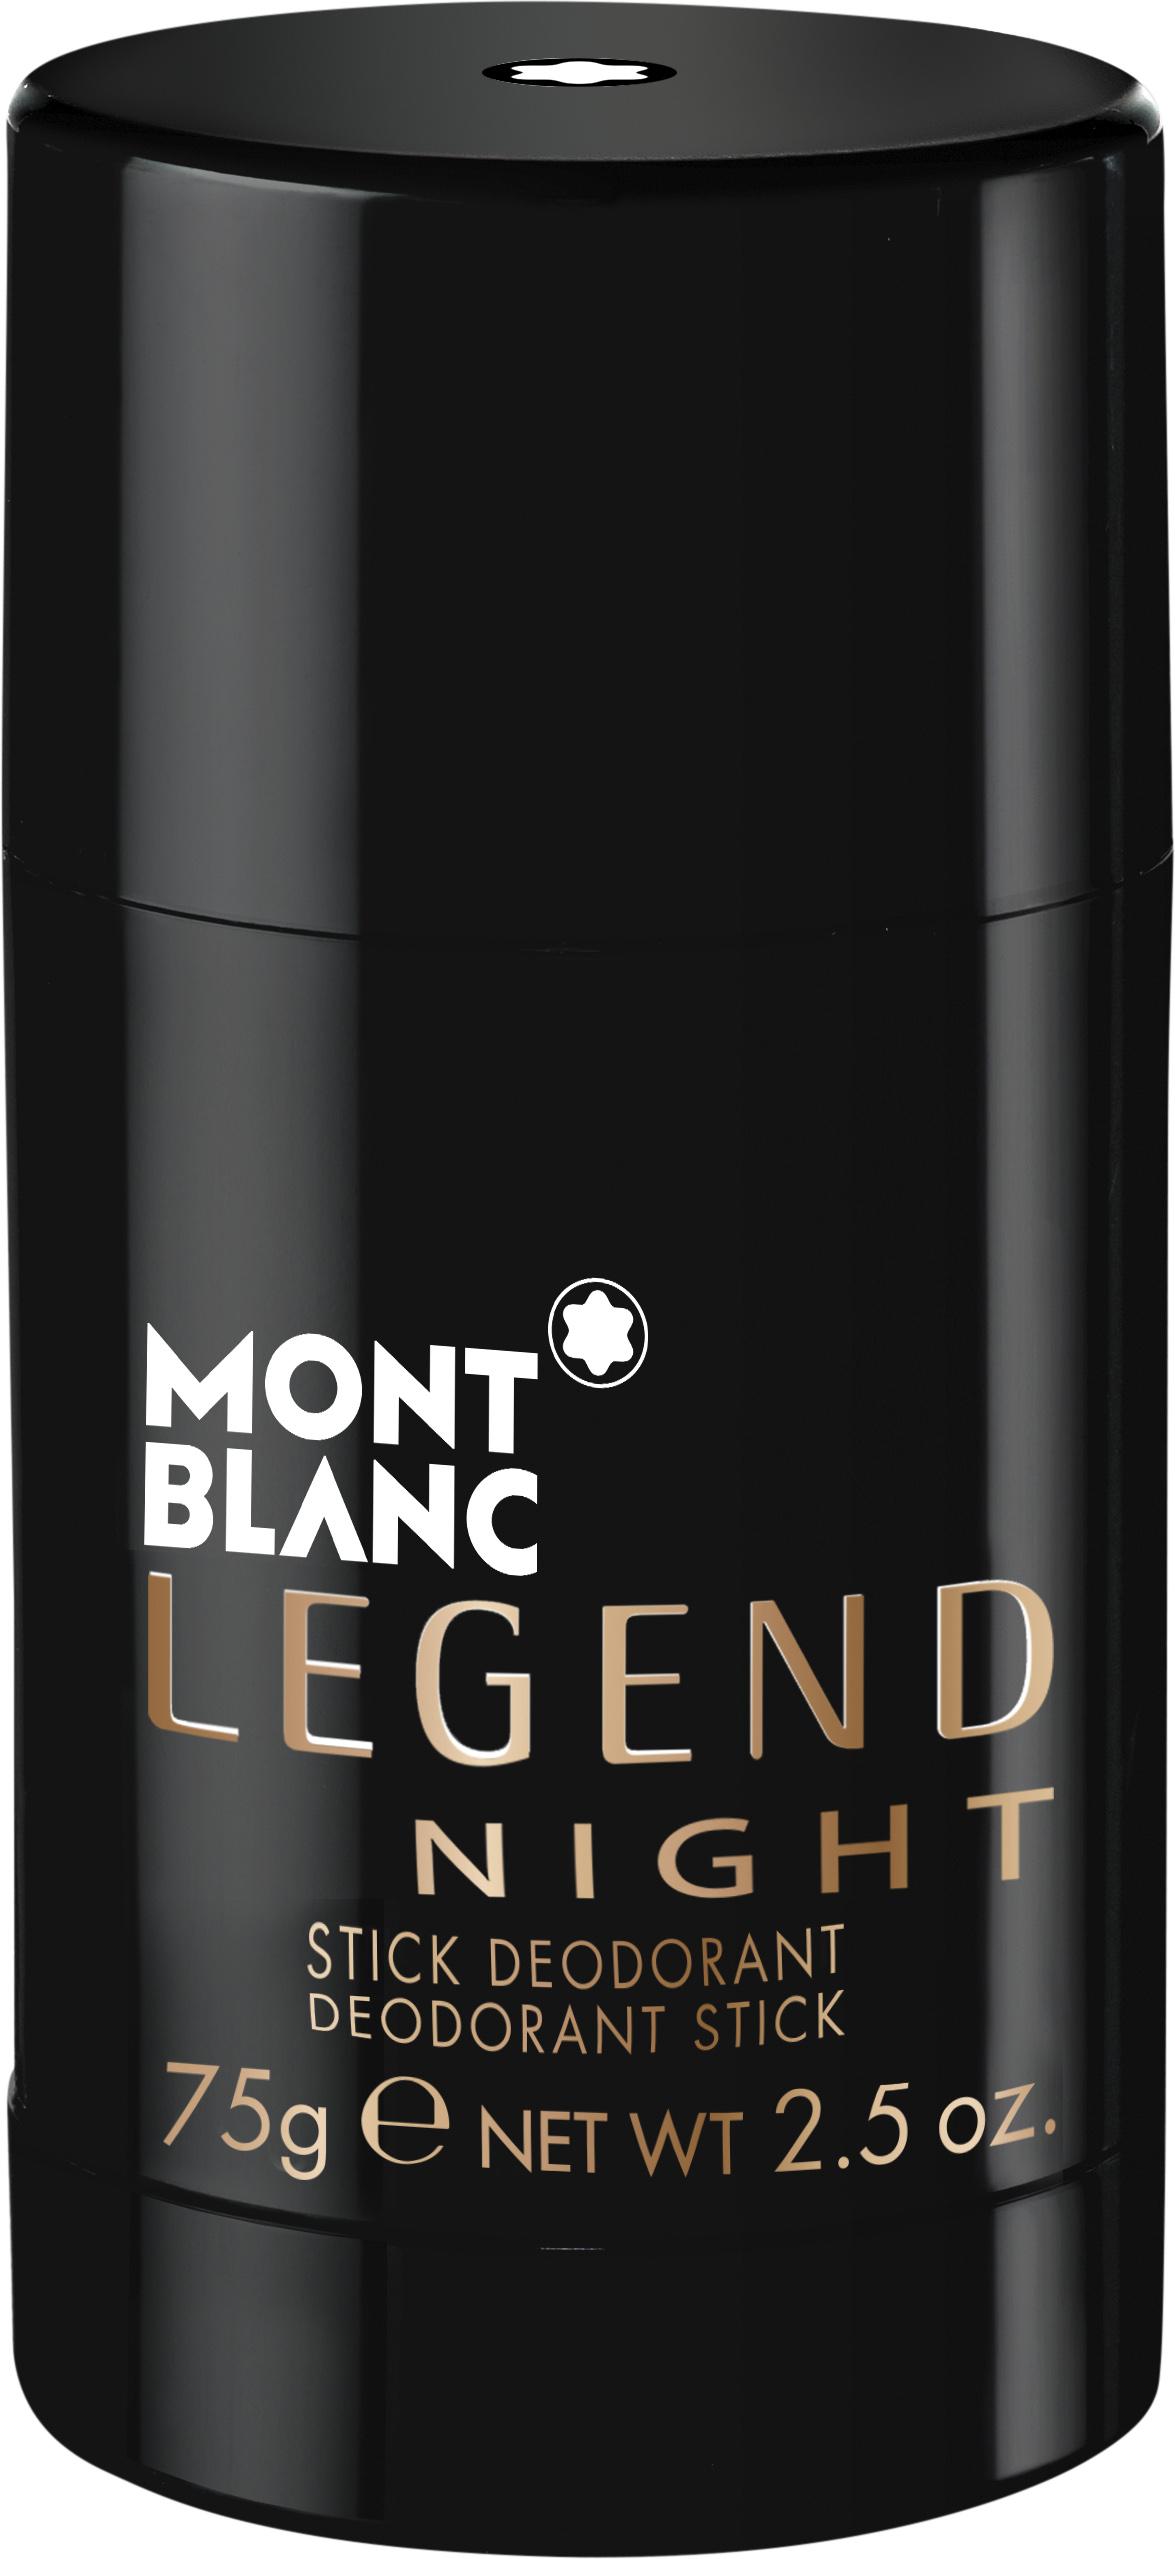 Mont Blanc Legend Night Deodorant Stick M 75g